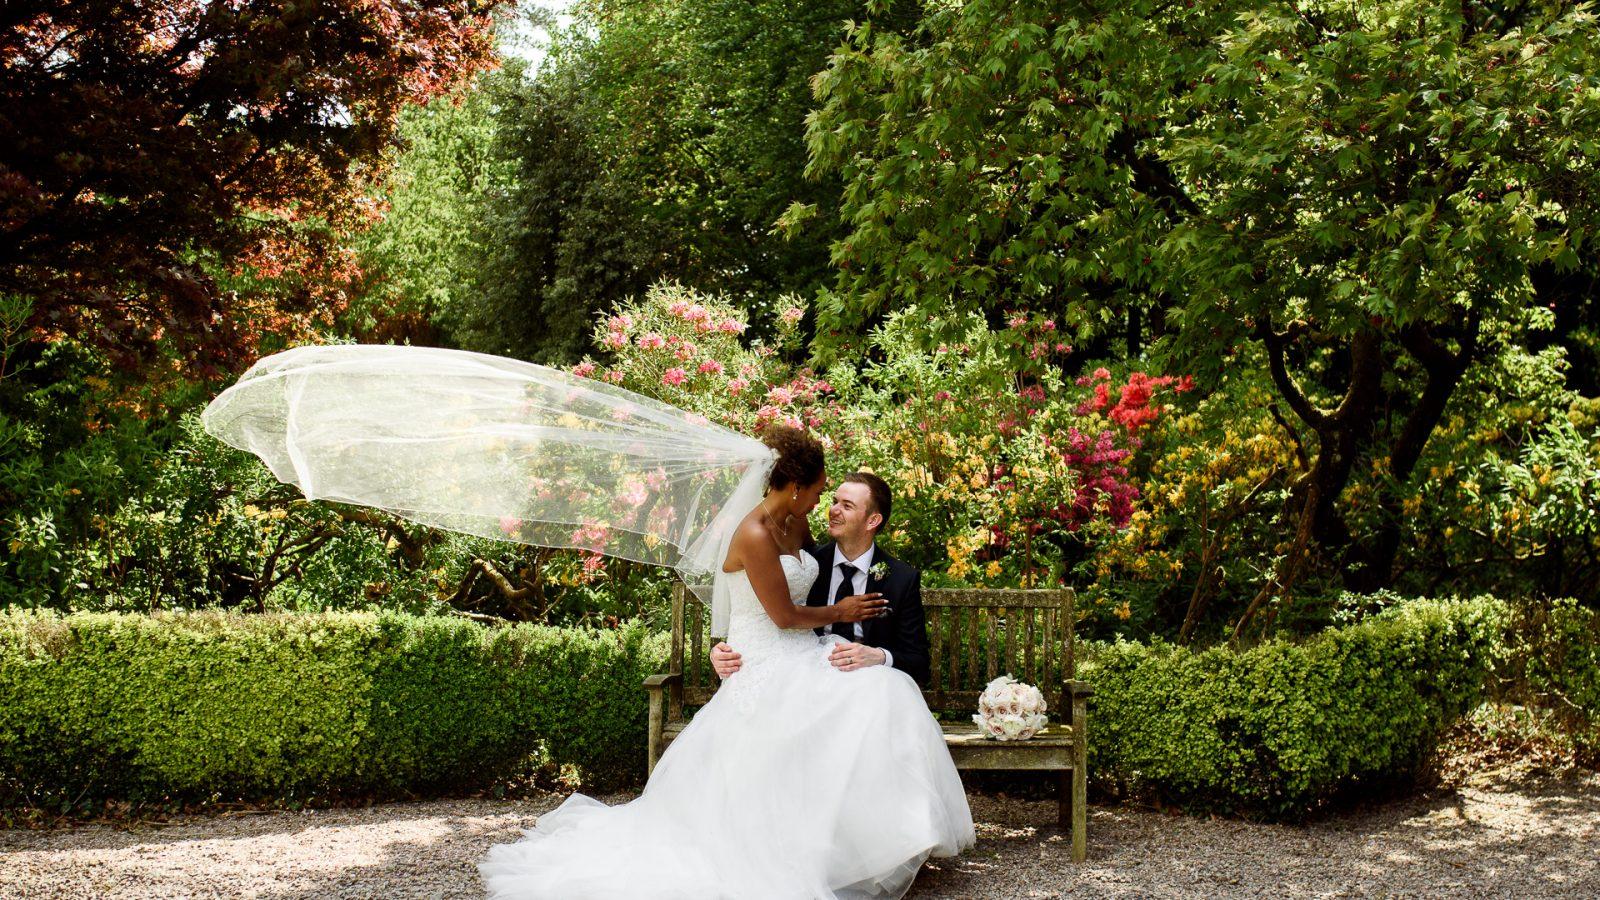 best-wedding-photos-2017-kimberley-and-joseph-bride-on-grooms-knee-veil